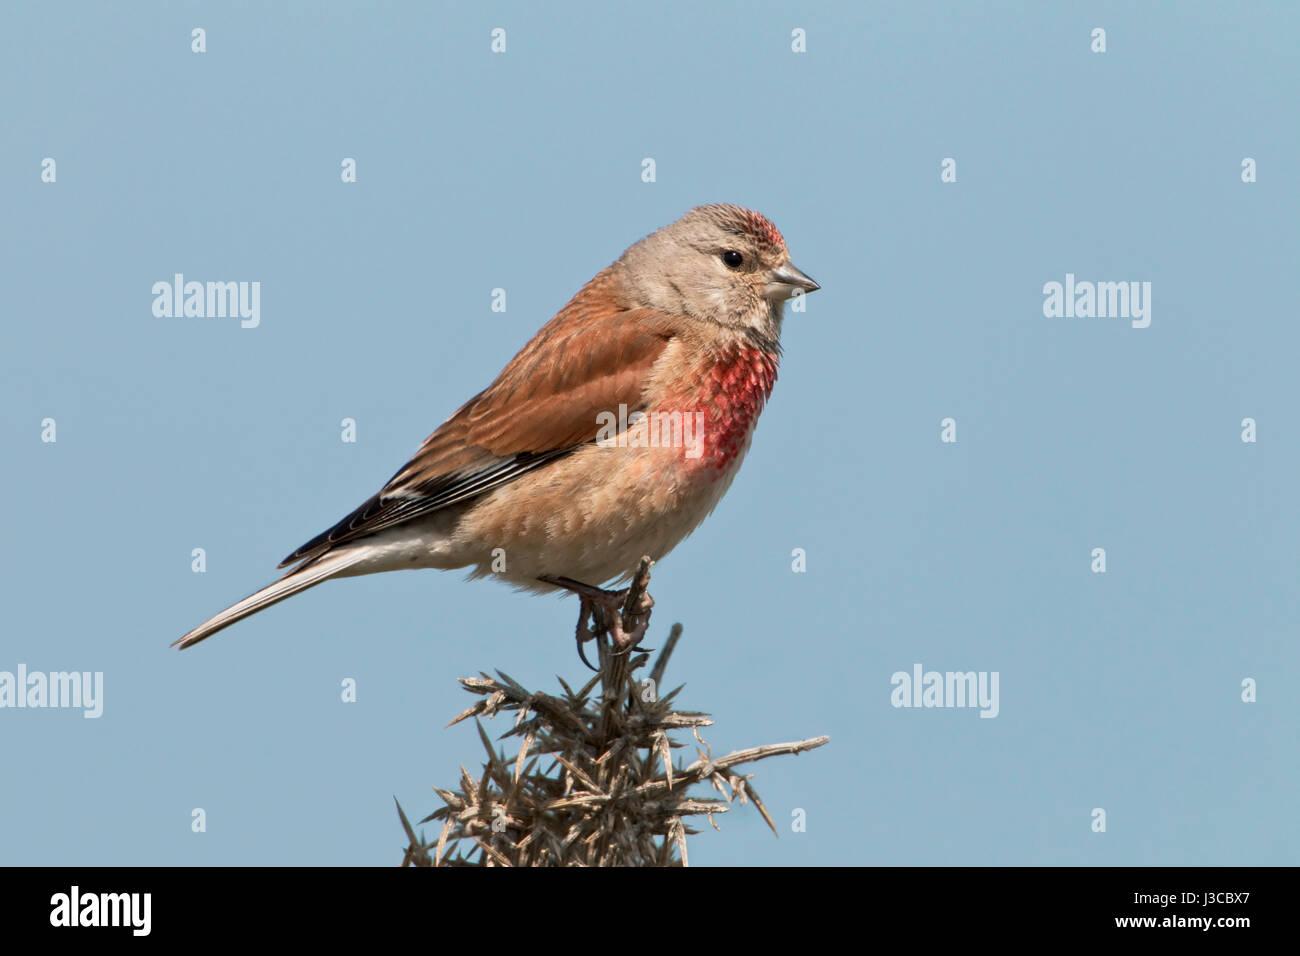 Linnet - Carduelis cannabina - male - Stock Image